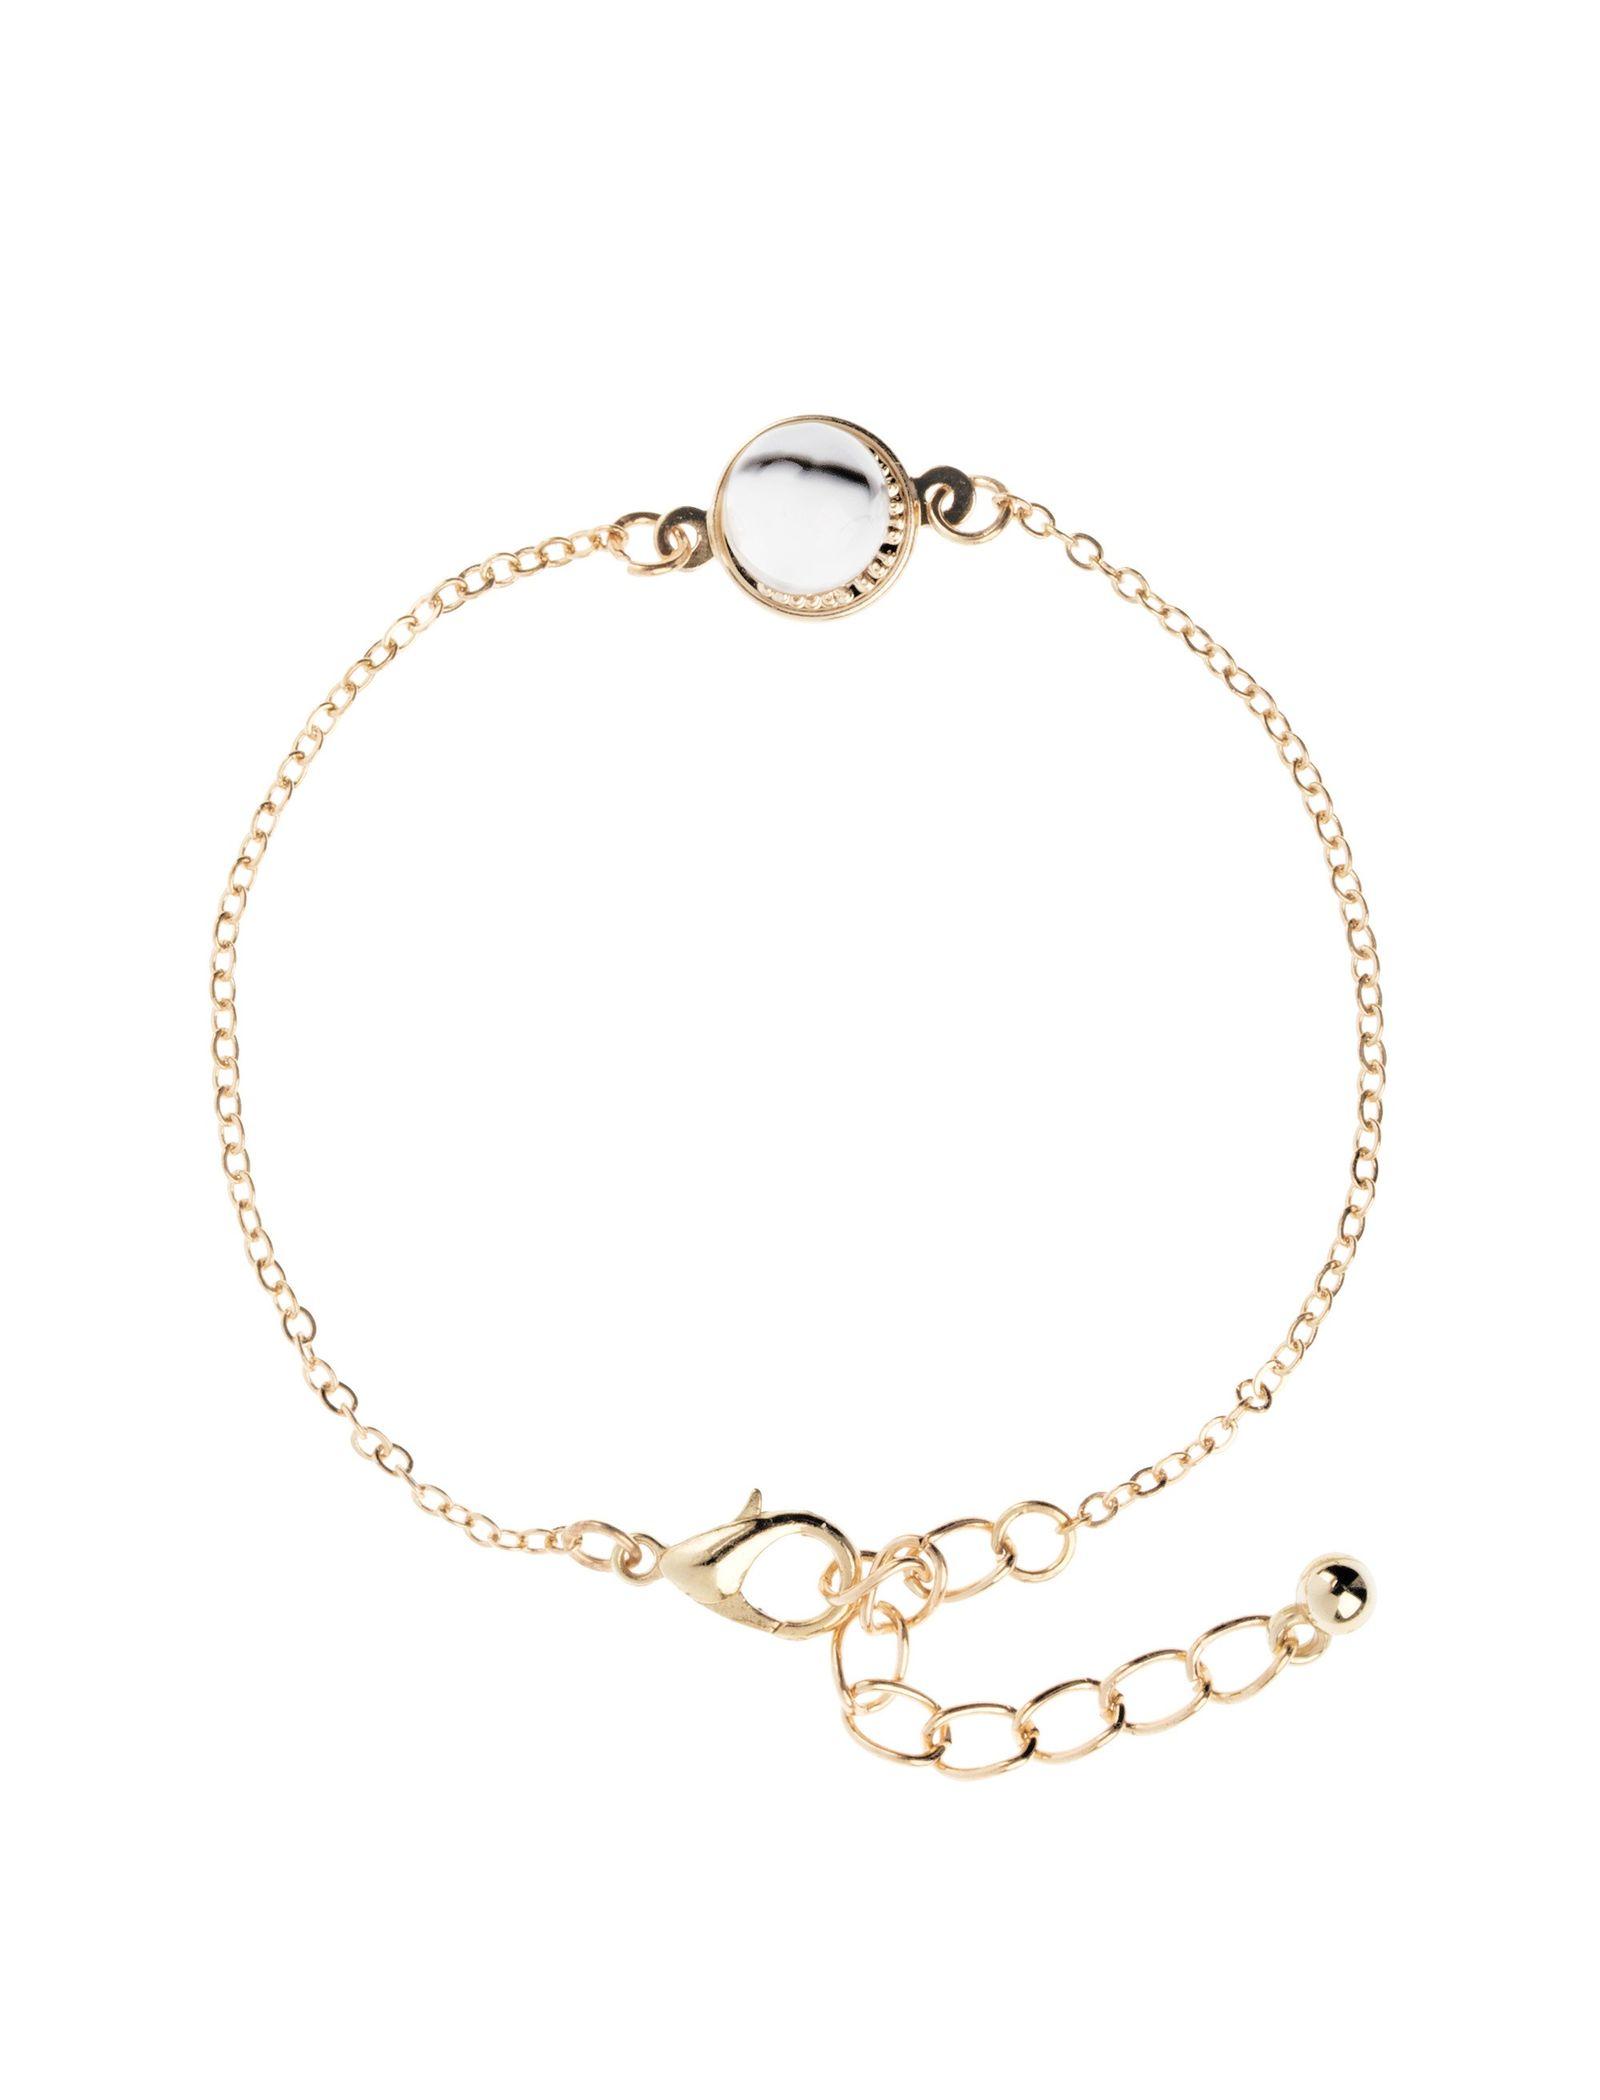 دستبند زنانه بسته 3 عددی - کوتون - طلايي/ طوسي - 3